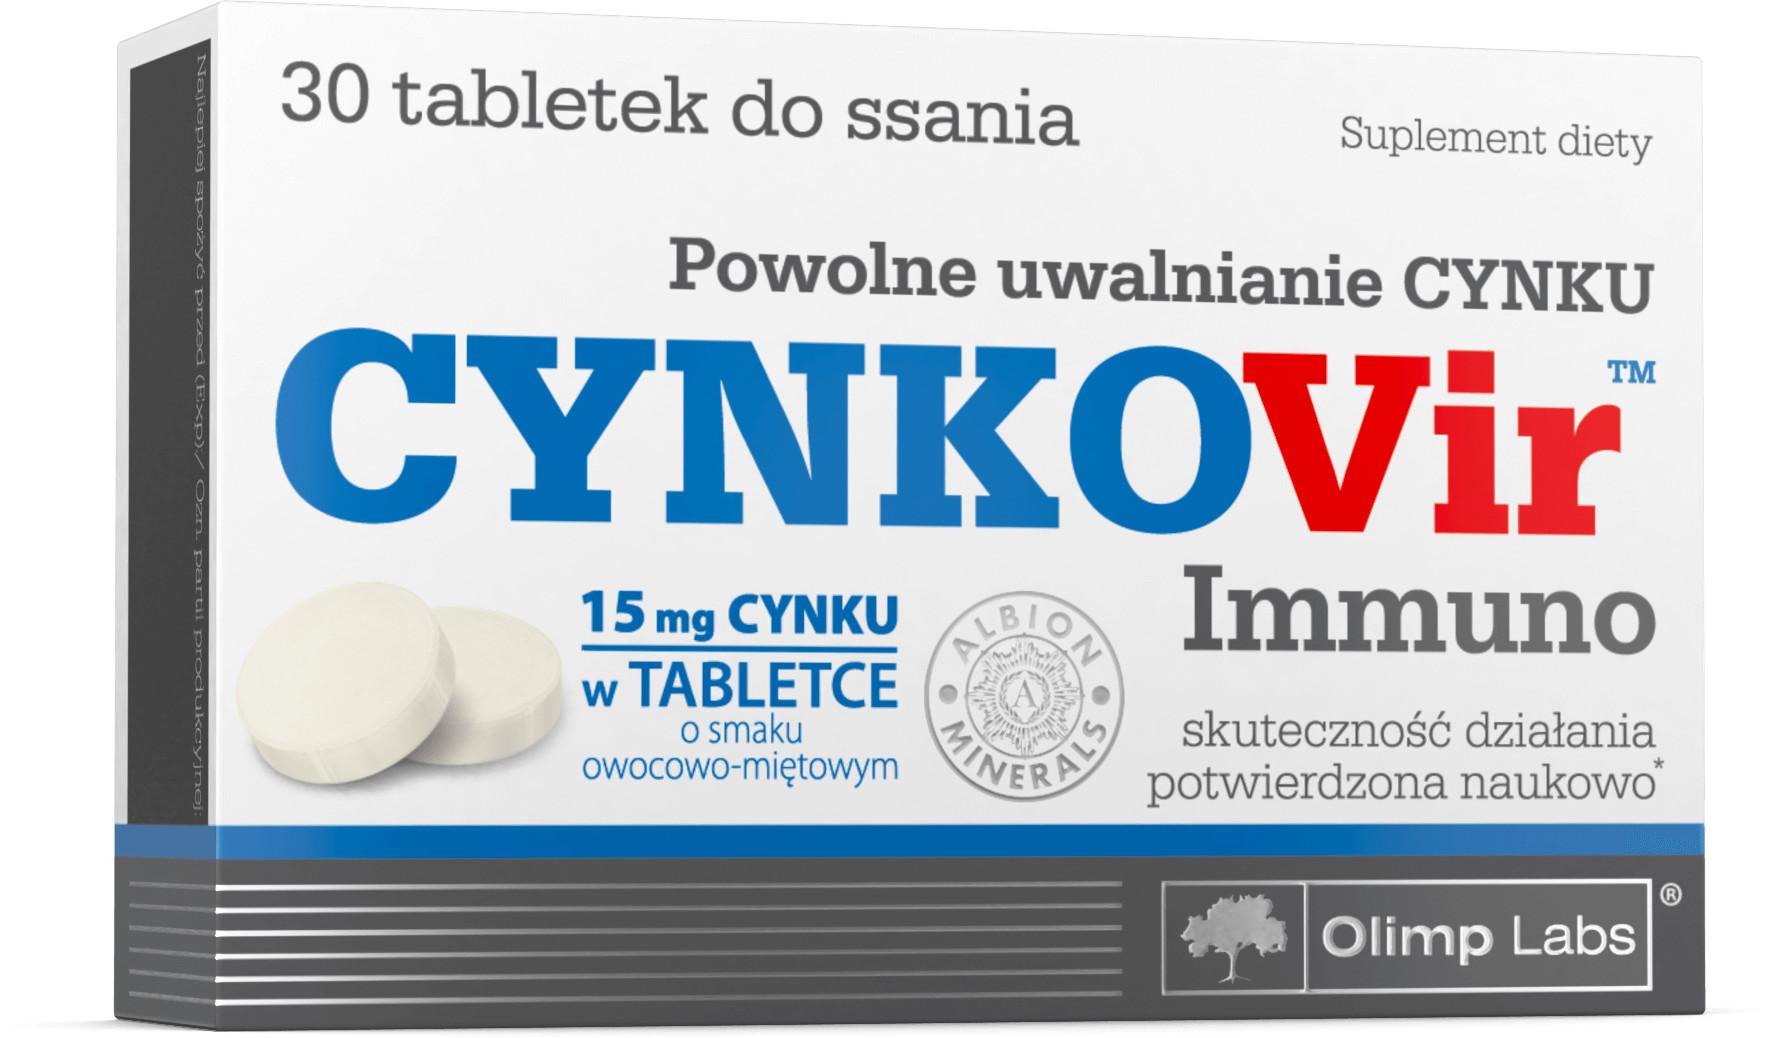 Olimp LABS Cynkovir Immuno x 30 tabl do ssania